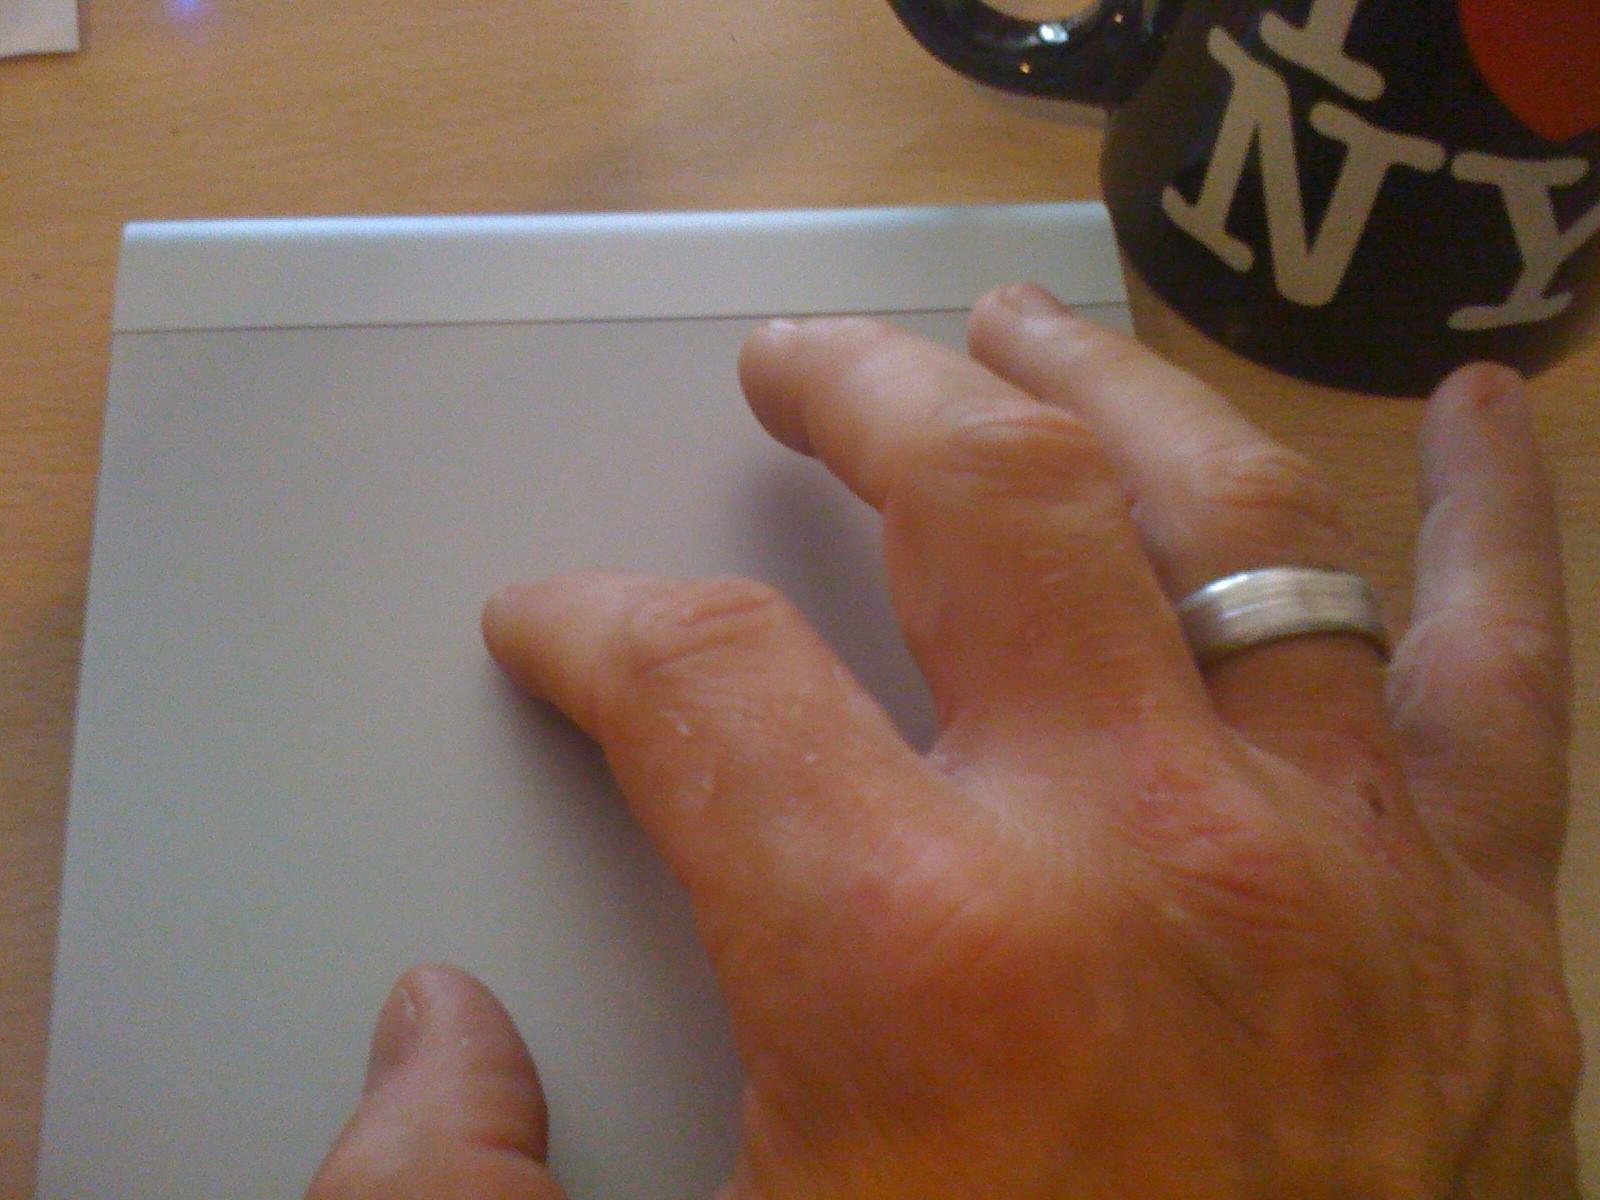 Apple Trackpad - Foto frisch-gebloggt.de